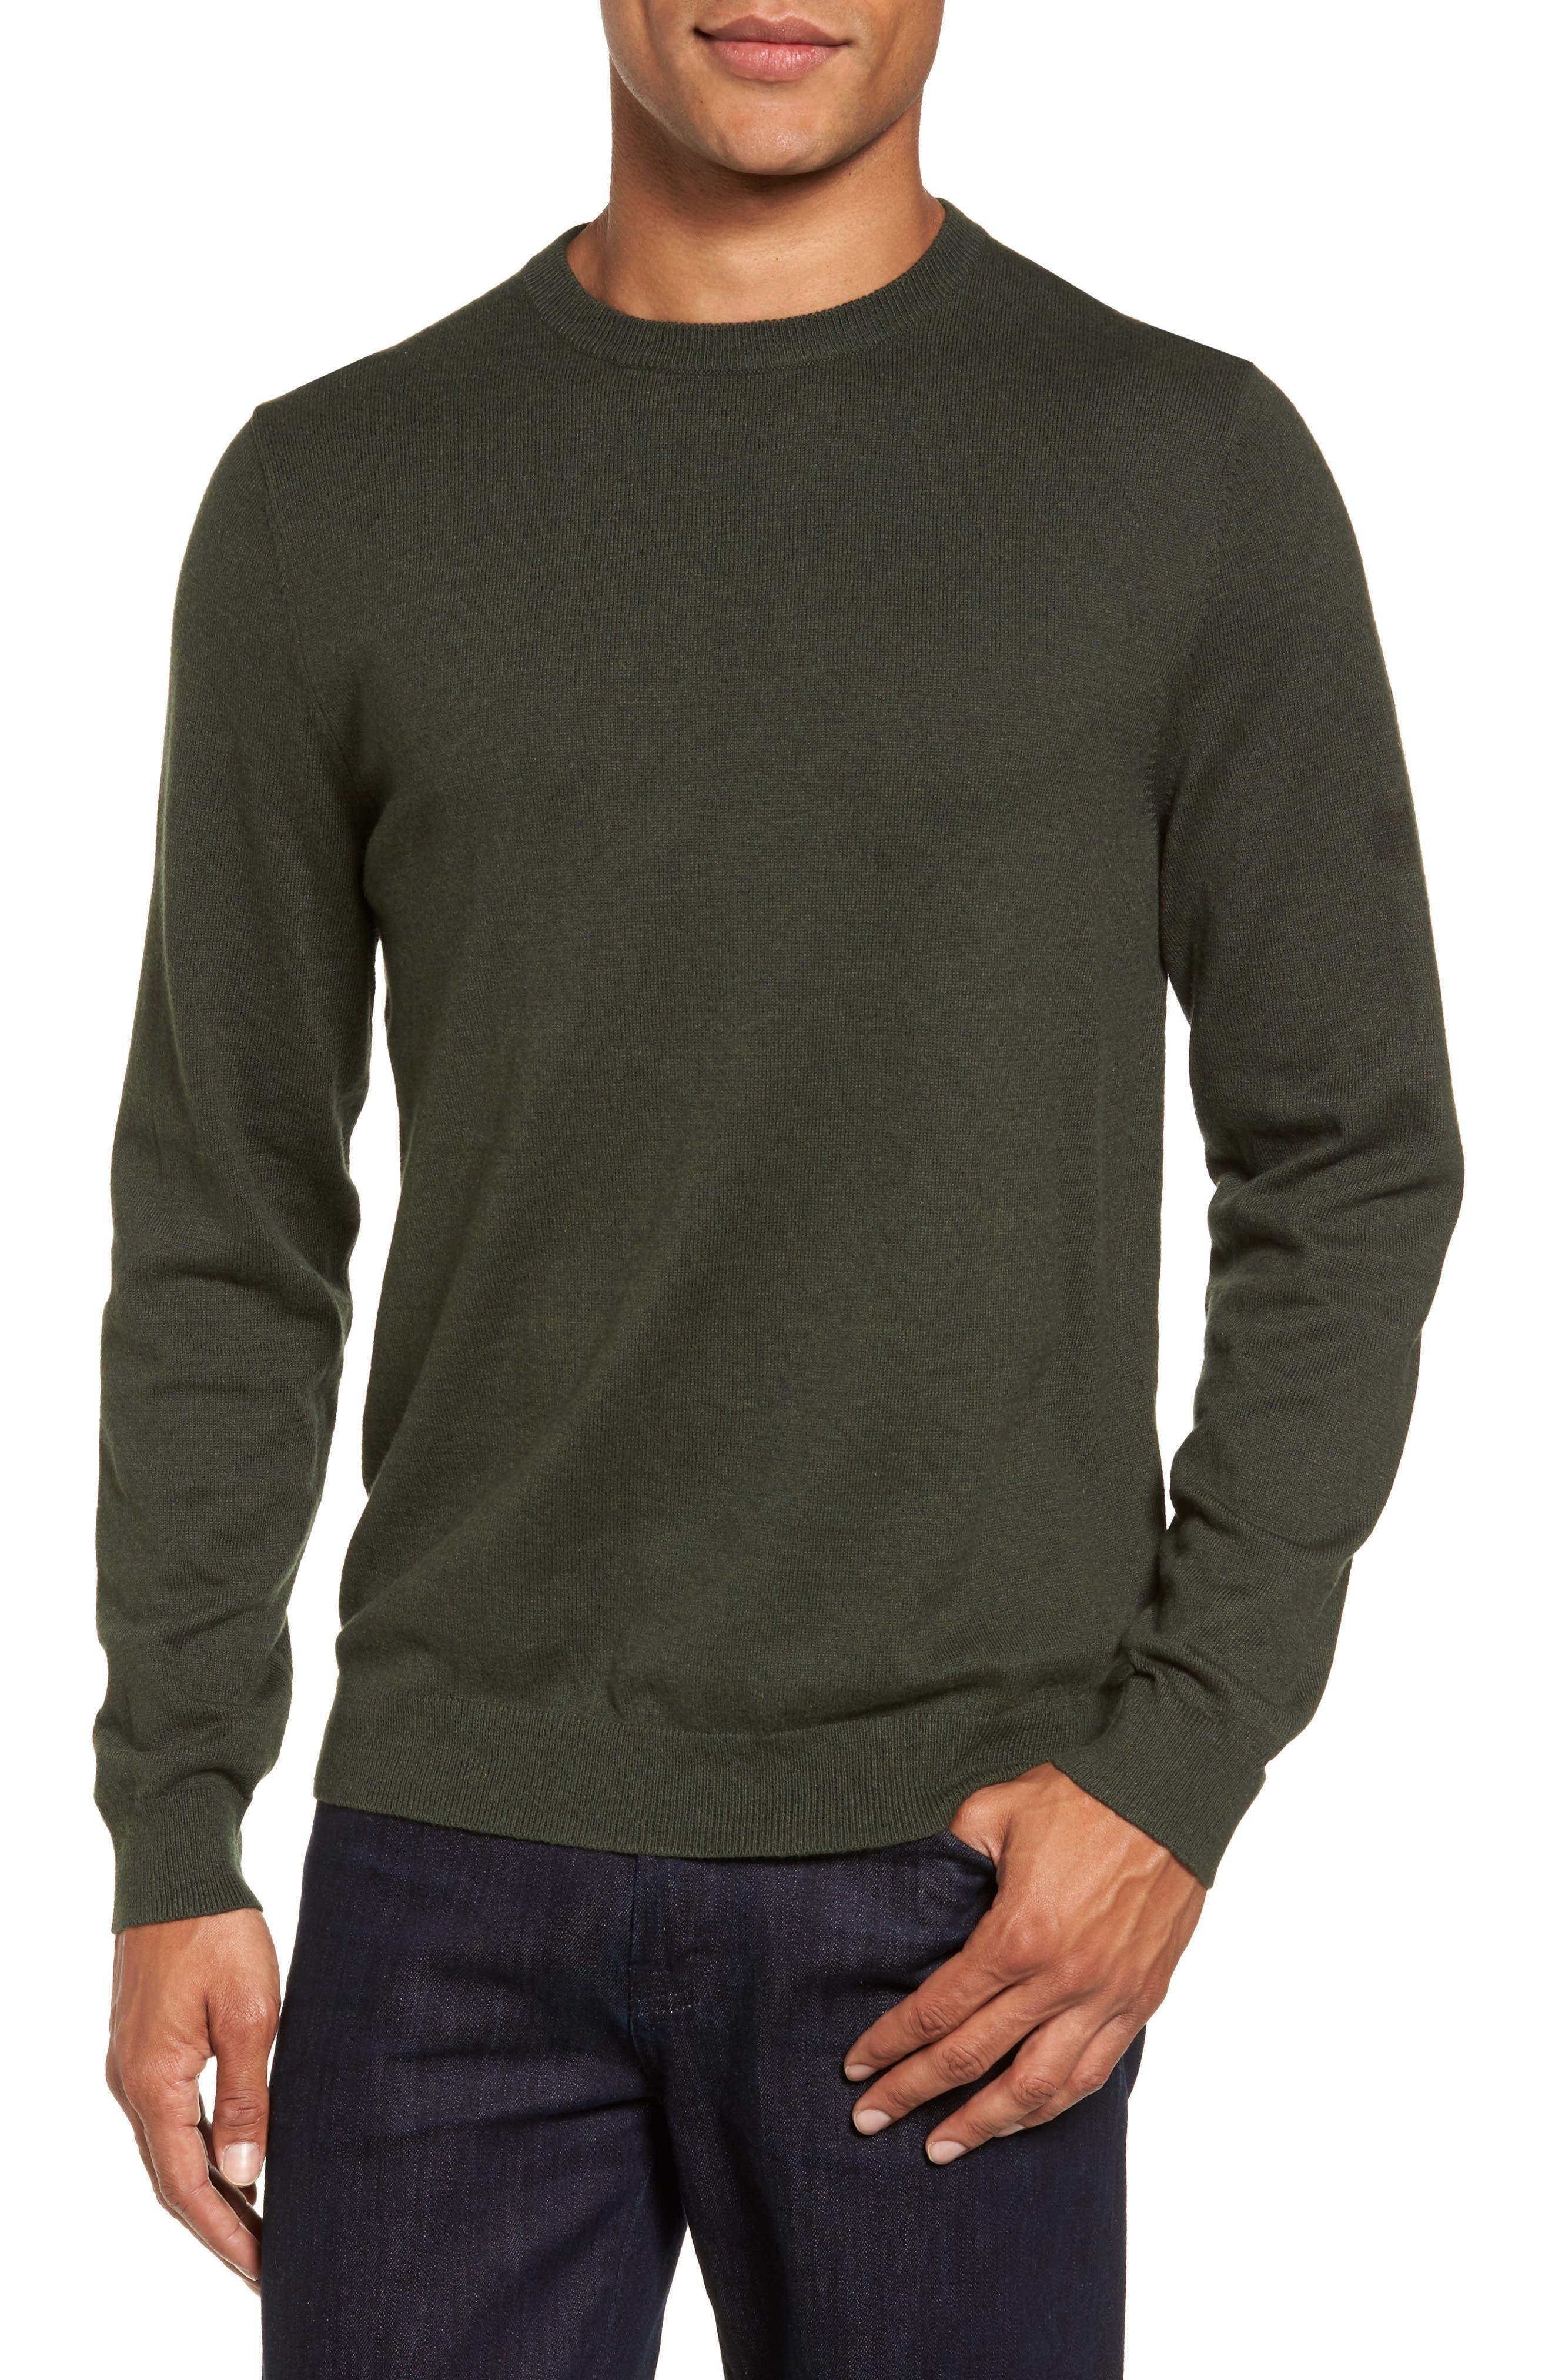 Cotton & Cashmere Crewneck Sweater,                         Main,                         color, Green Deep Pine